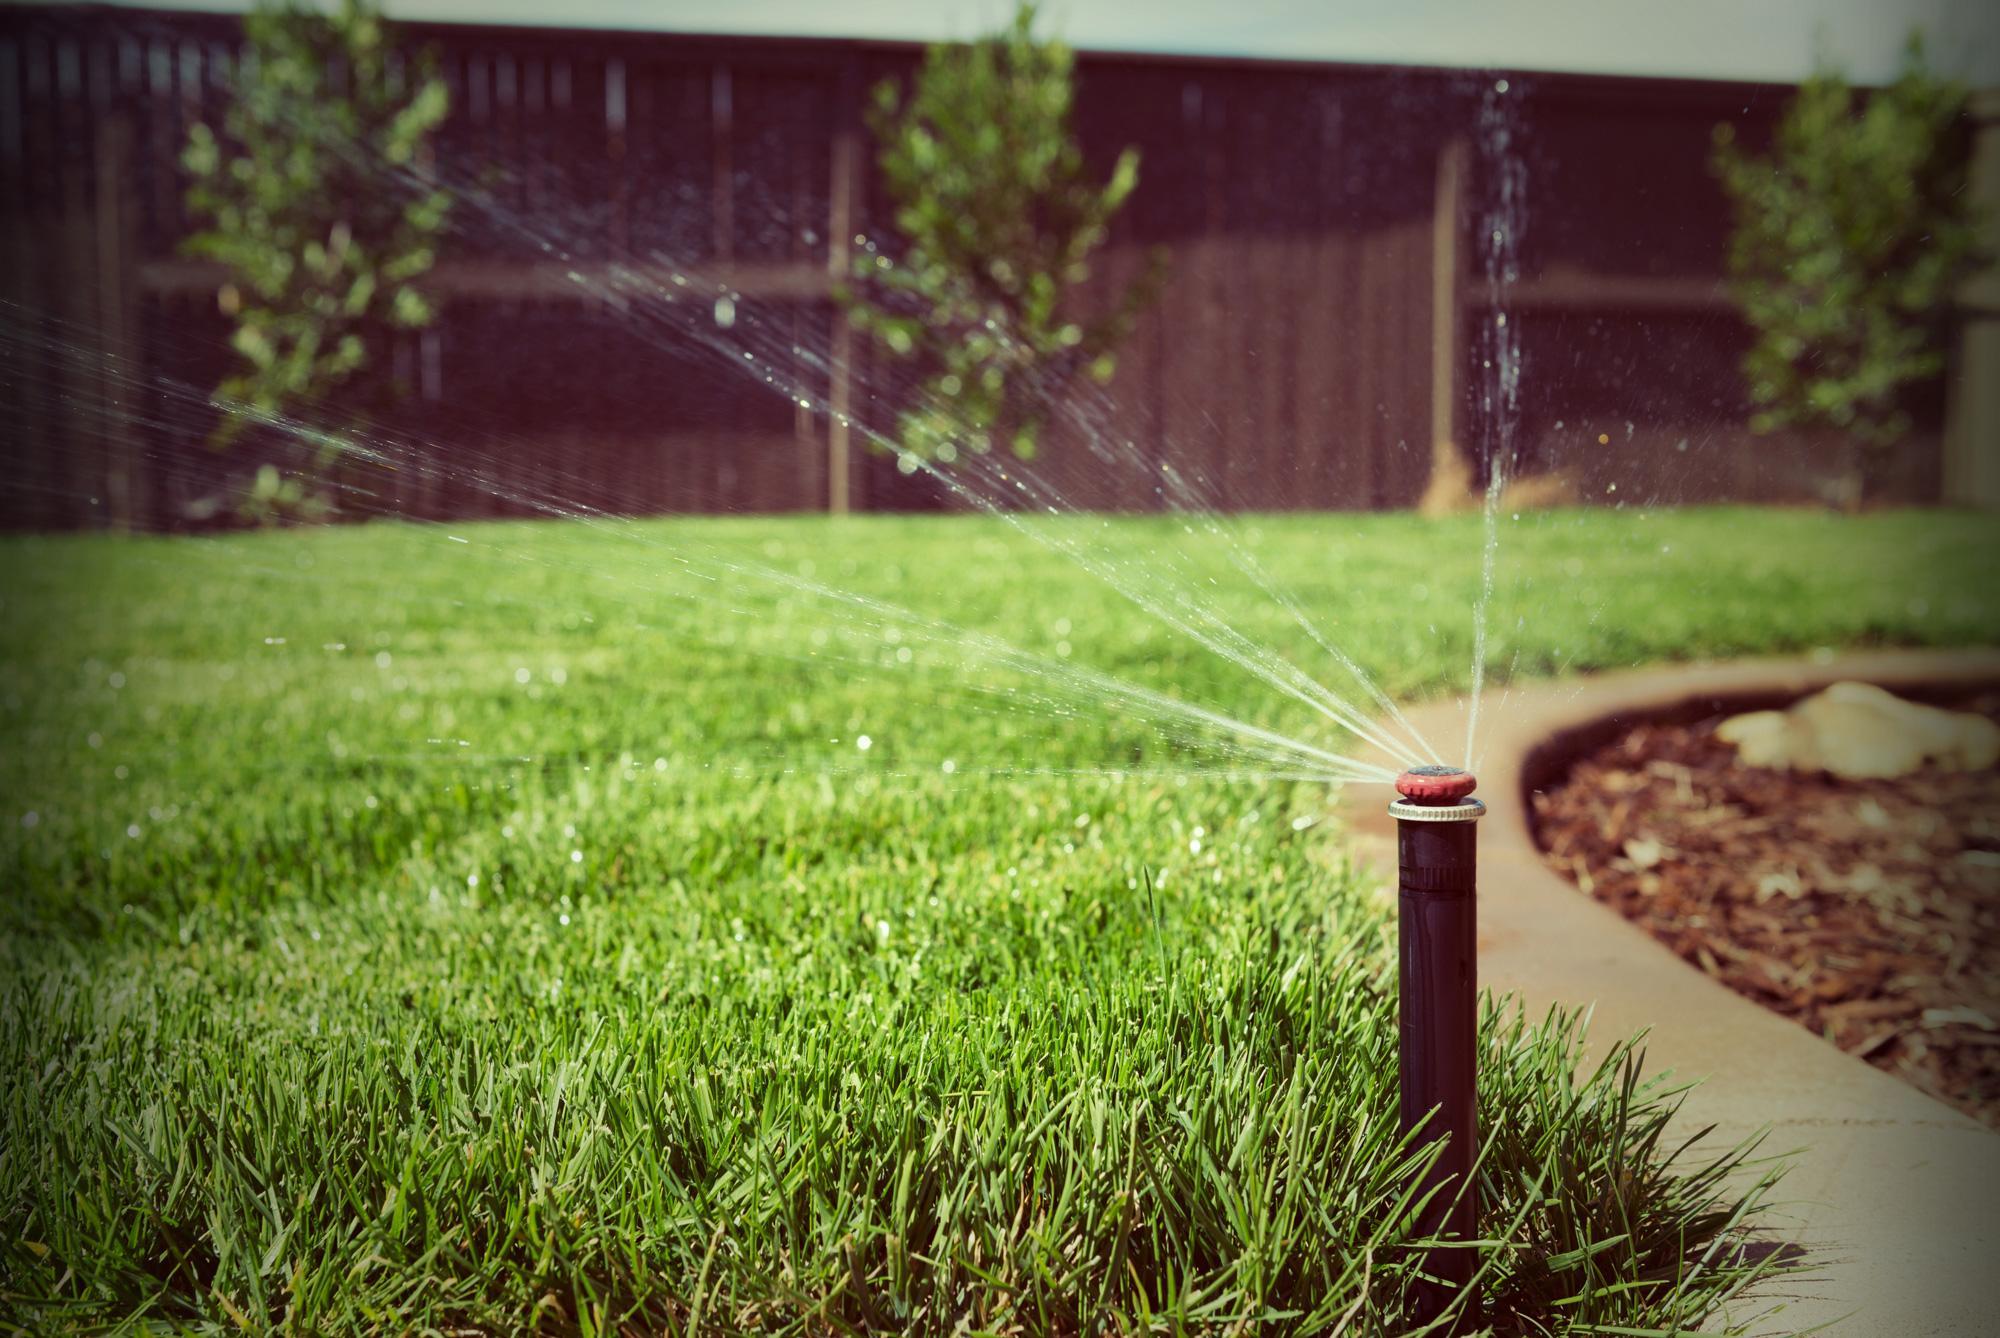 North Texas Outdoor Watering Summit